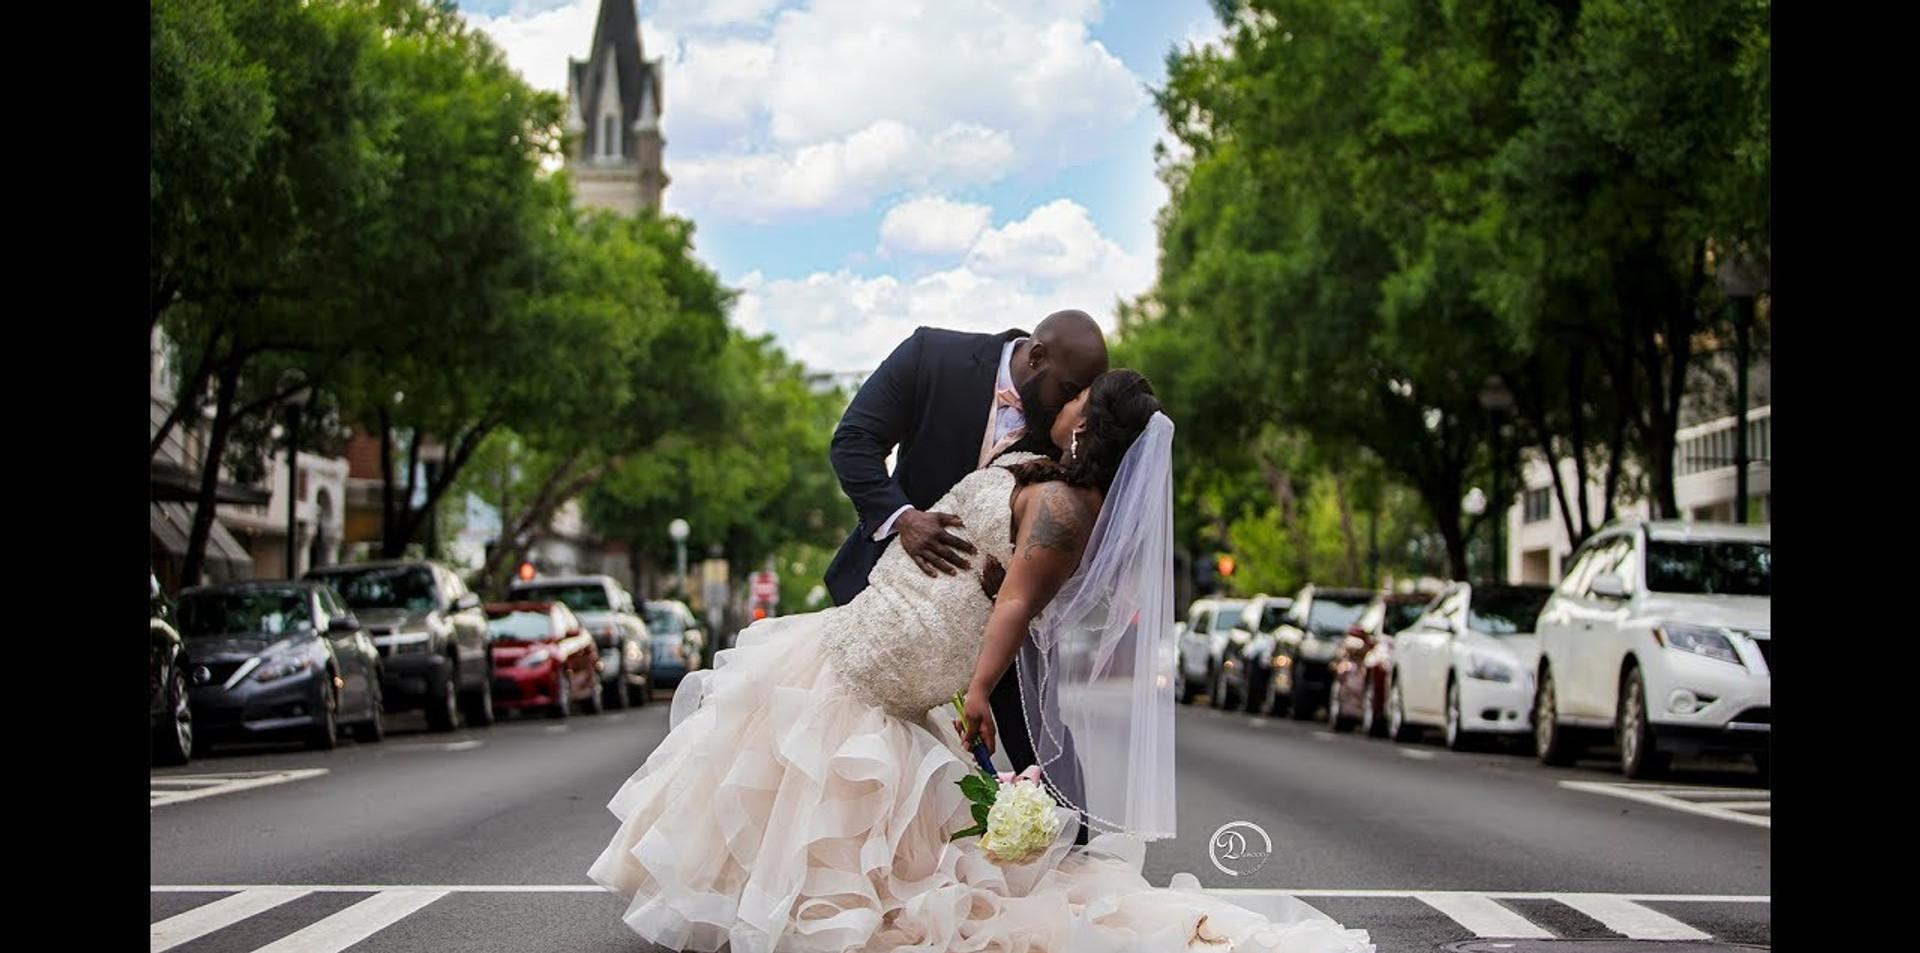 The Kelsie Wedding | The Patterson Valdosta, G